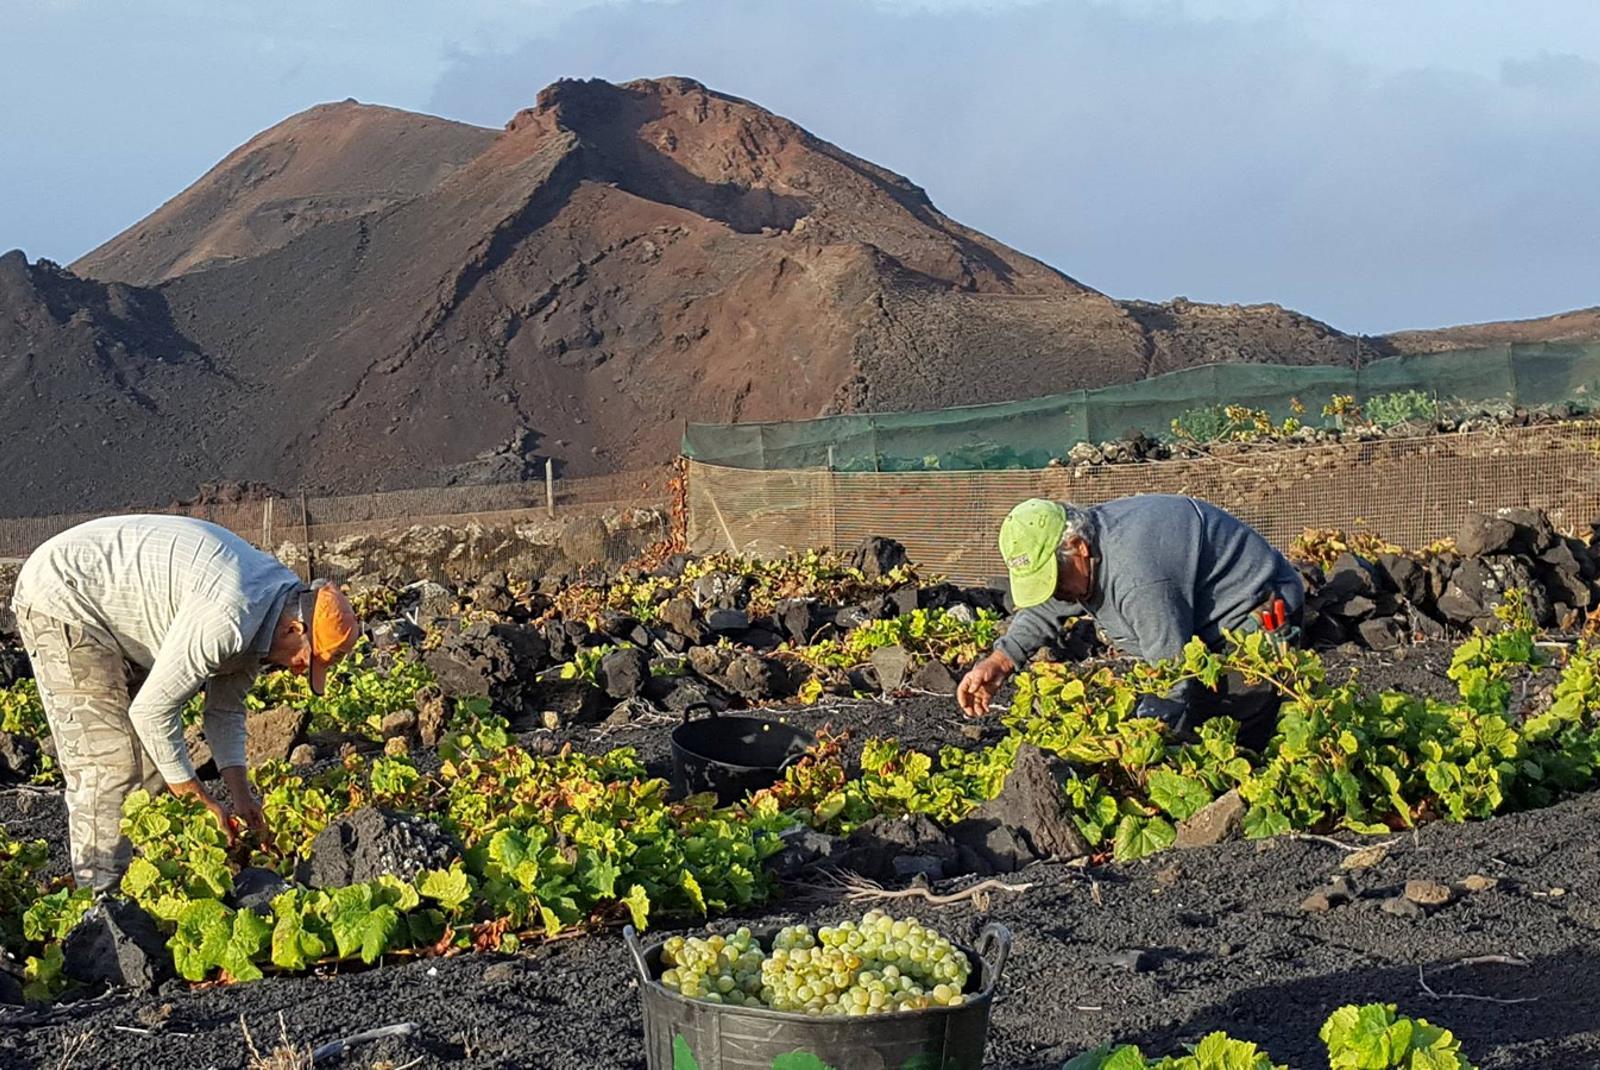 Visit-Bodegas-Teneguia-winery-with-wine-Tasting-3